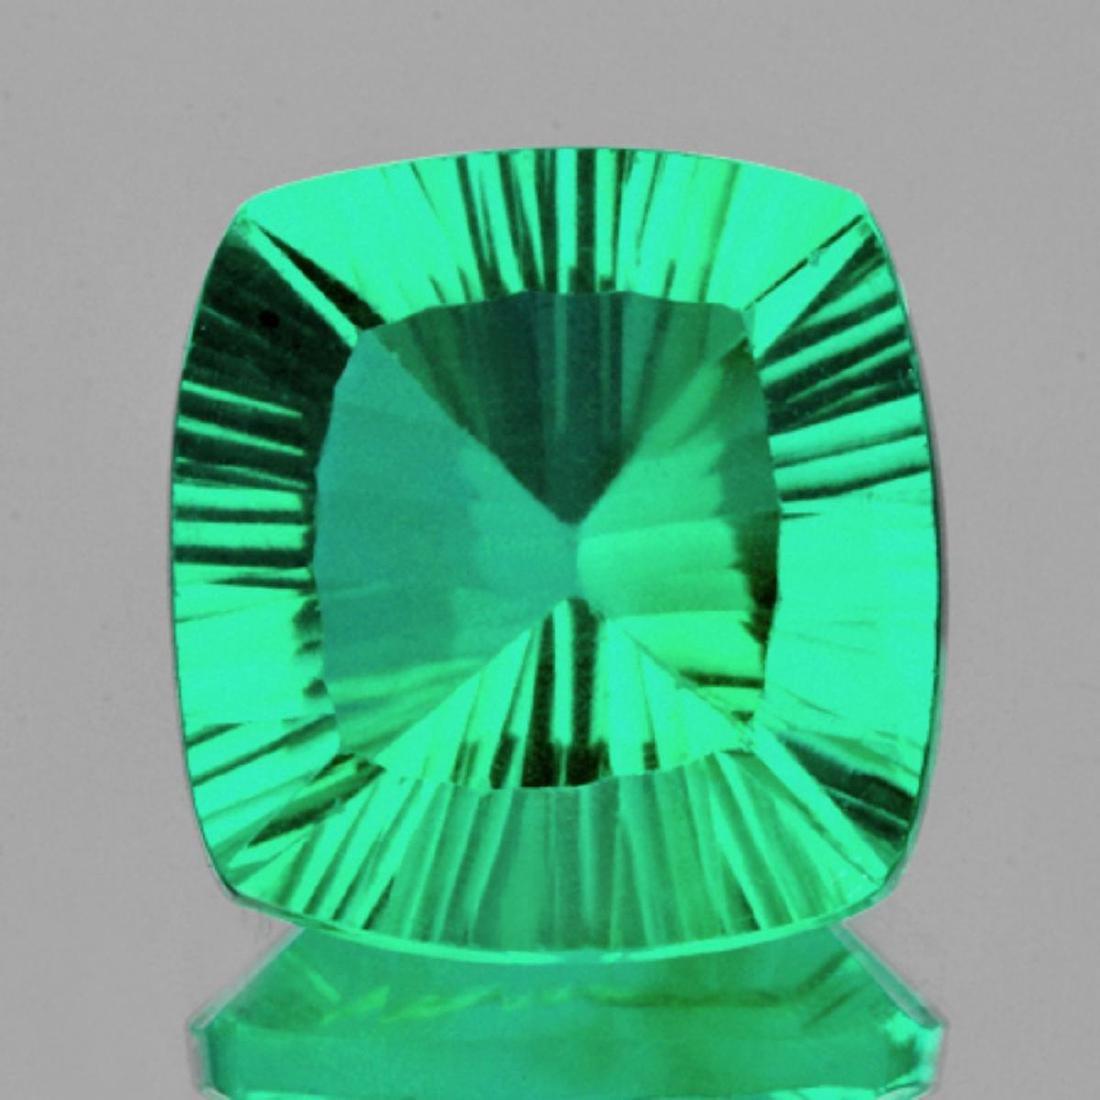 Natural Paraiba Blue Green Fluorite 30.60 Ct - FLawless